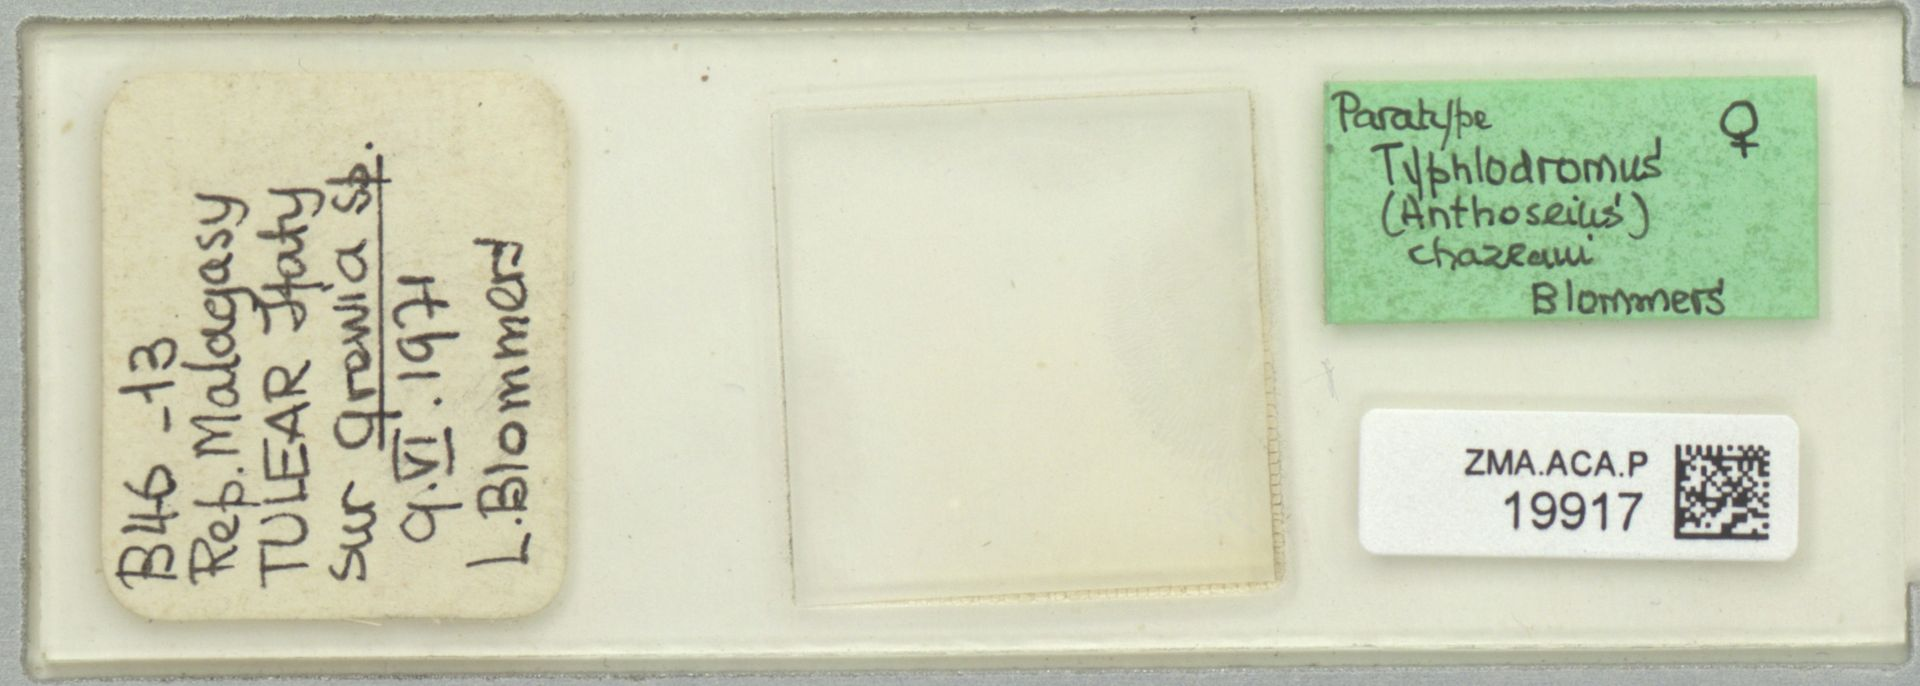 ZMA.ACA.P.19917 | Typhlodromus (Anthoseius) chazeaui